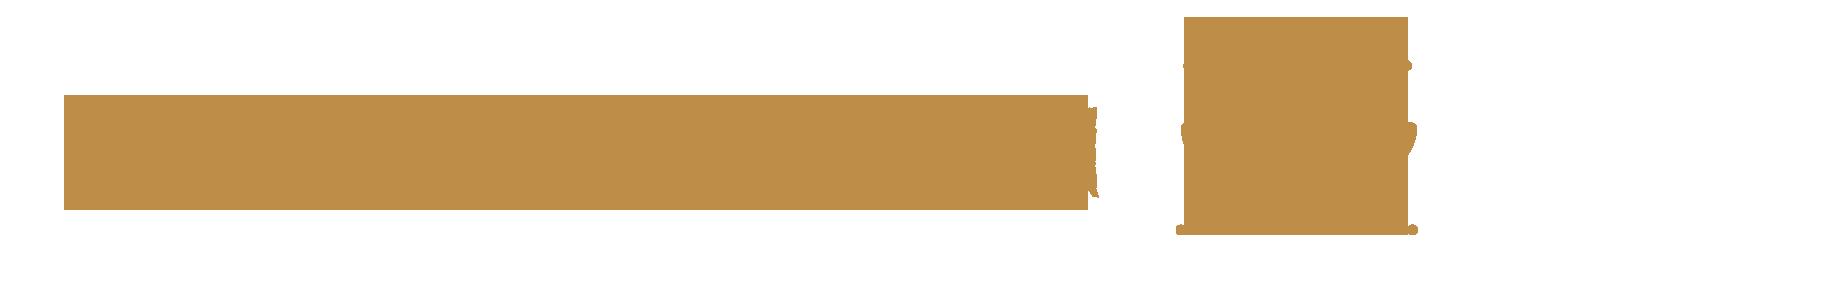 Cost-Optimization